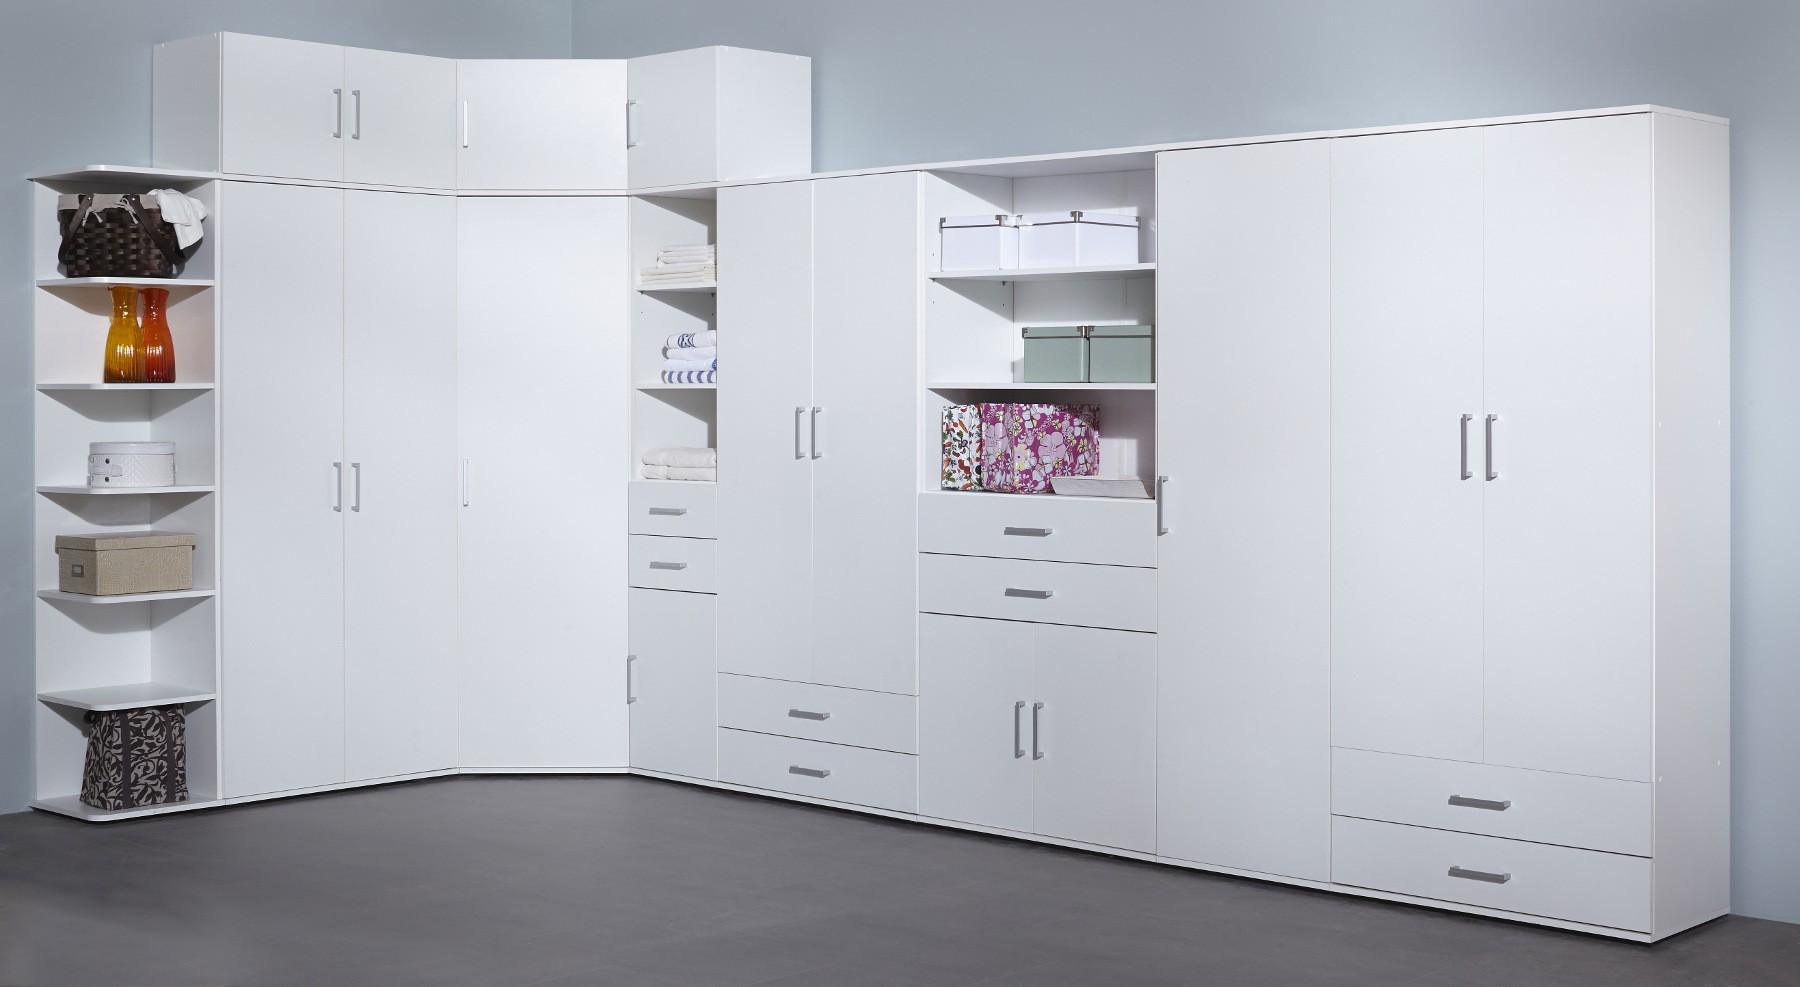 schrank staubsauger schrank staubsauger bugelbrett. Black Bedroom Furniture Sets. Home Design Ideas